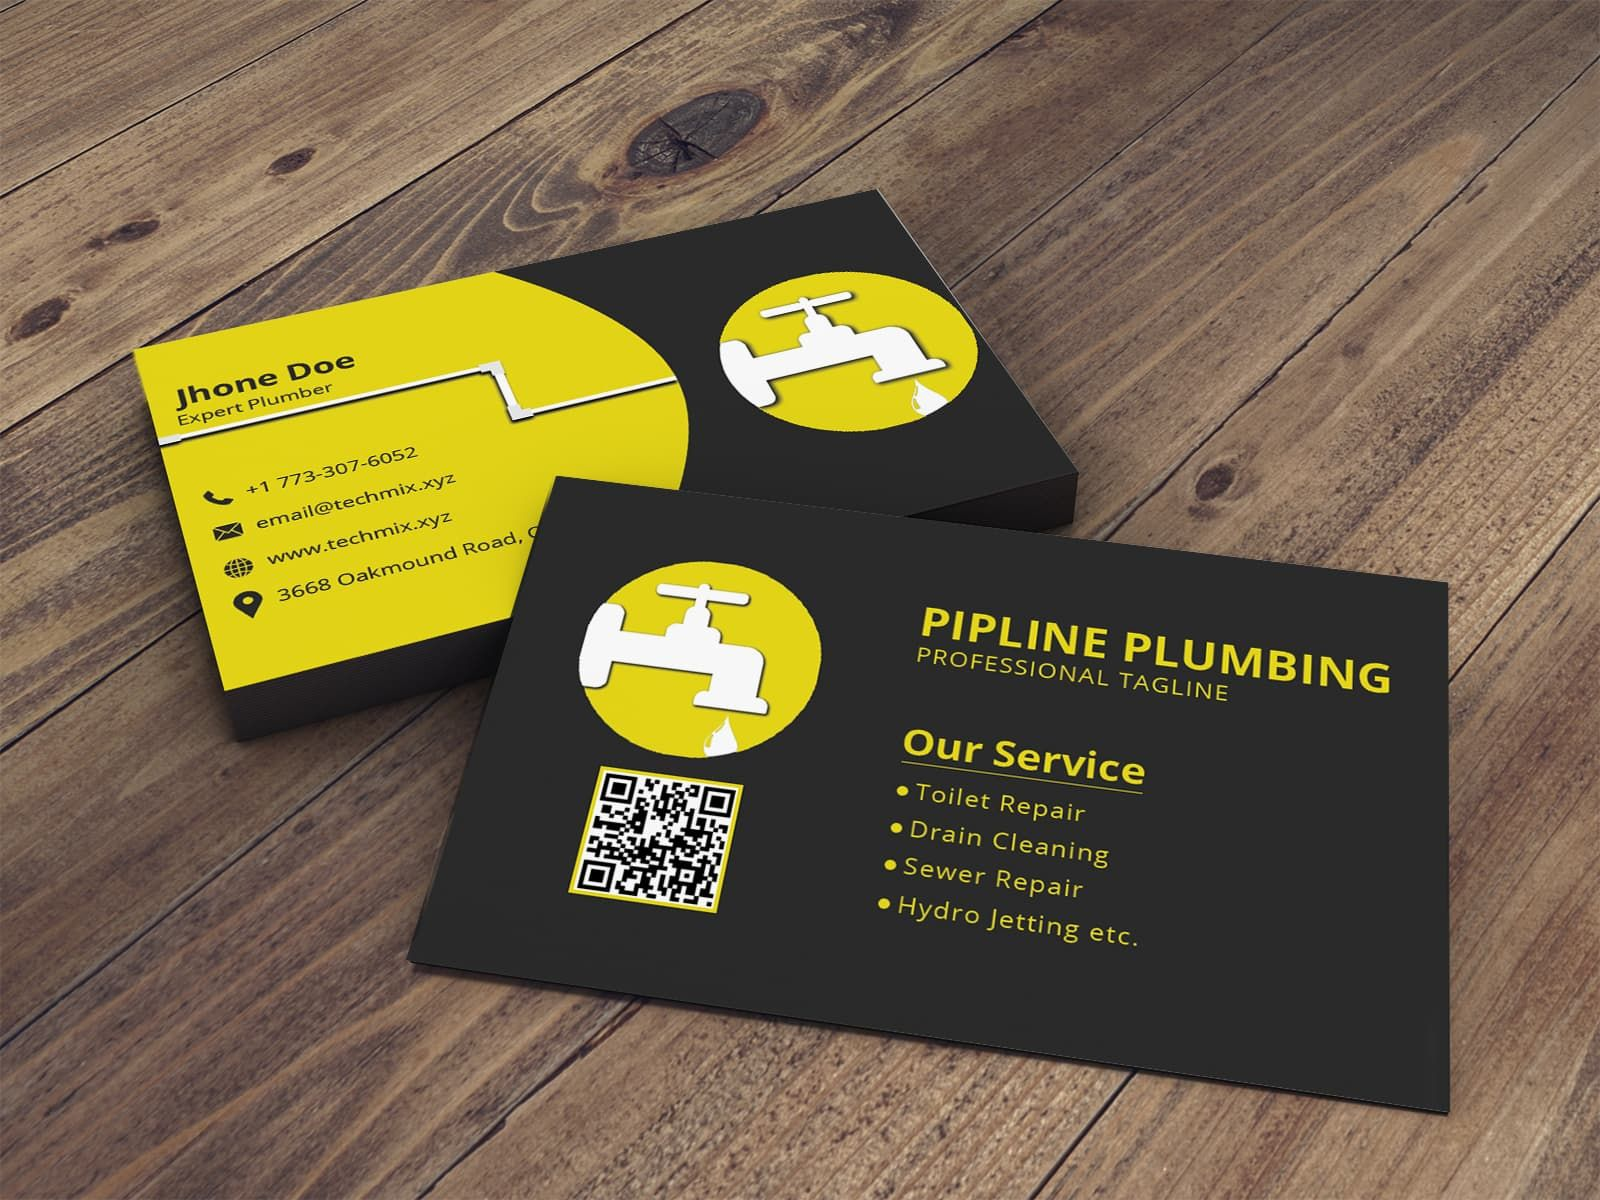 Plumber Business Card Design Template Business Card Template Design Business Card Design Business Card Design Creative